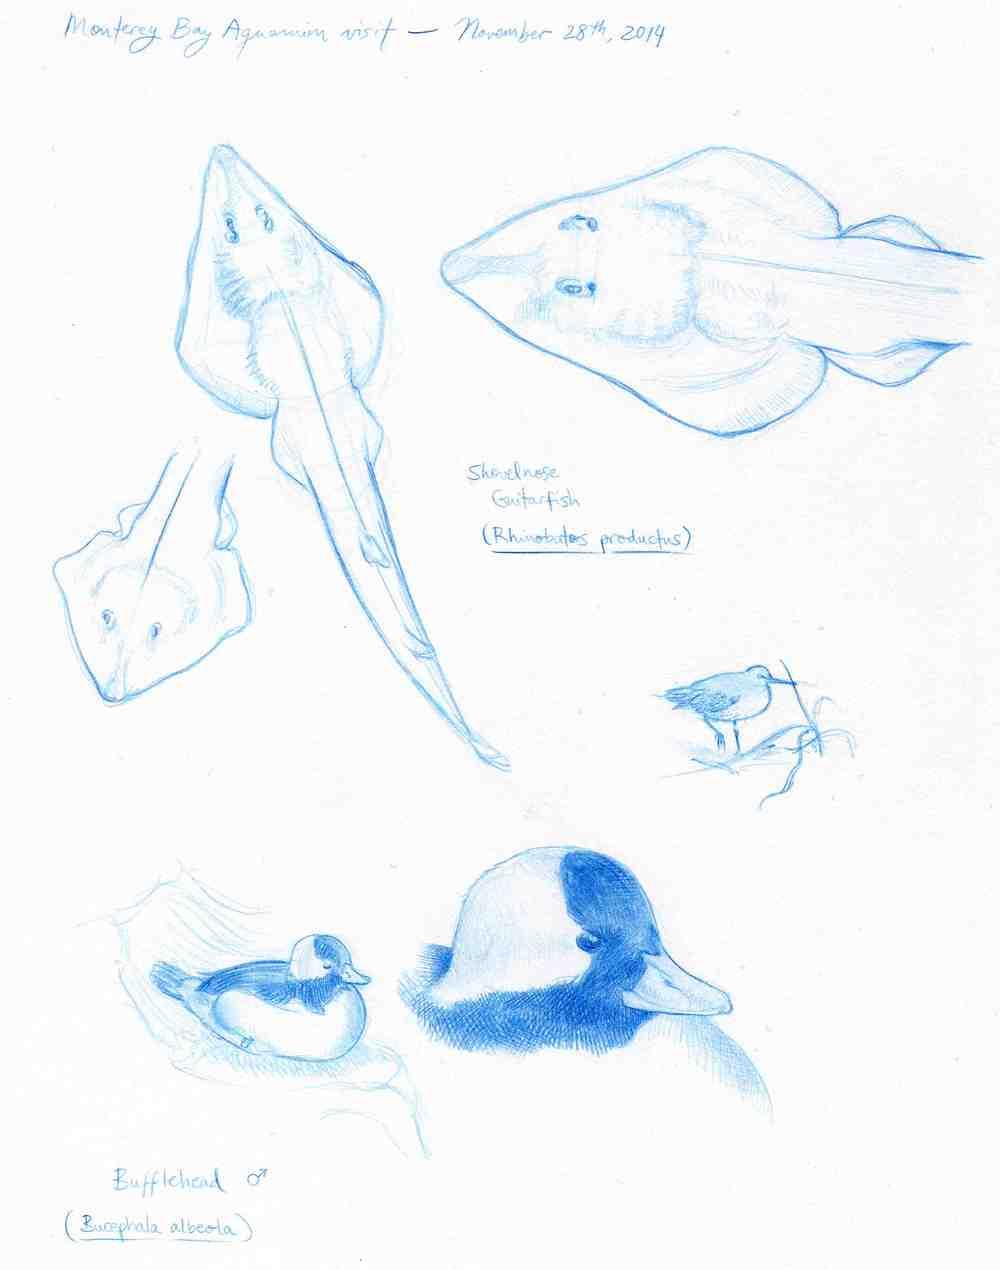 Guitarfish and Bufflehead